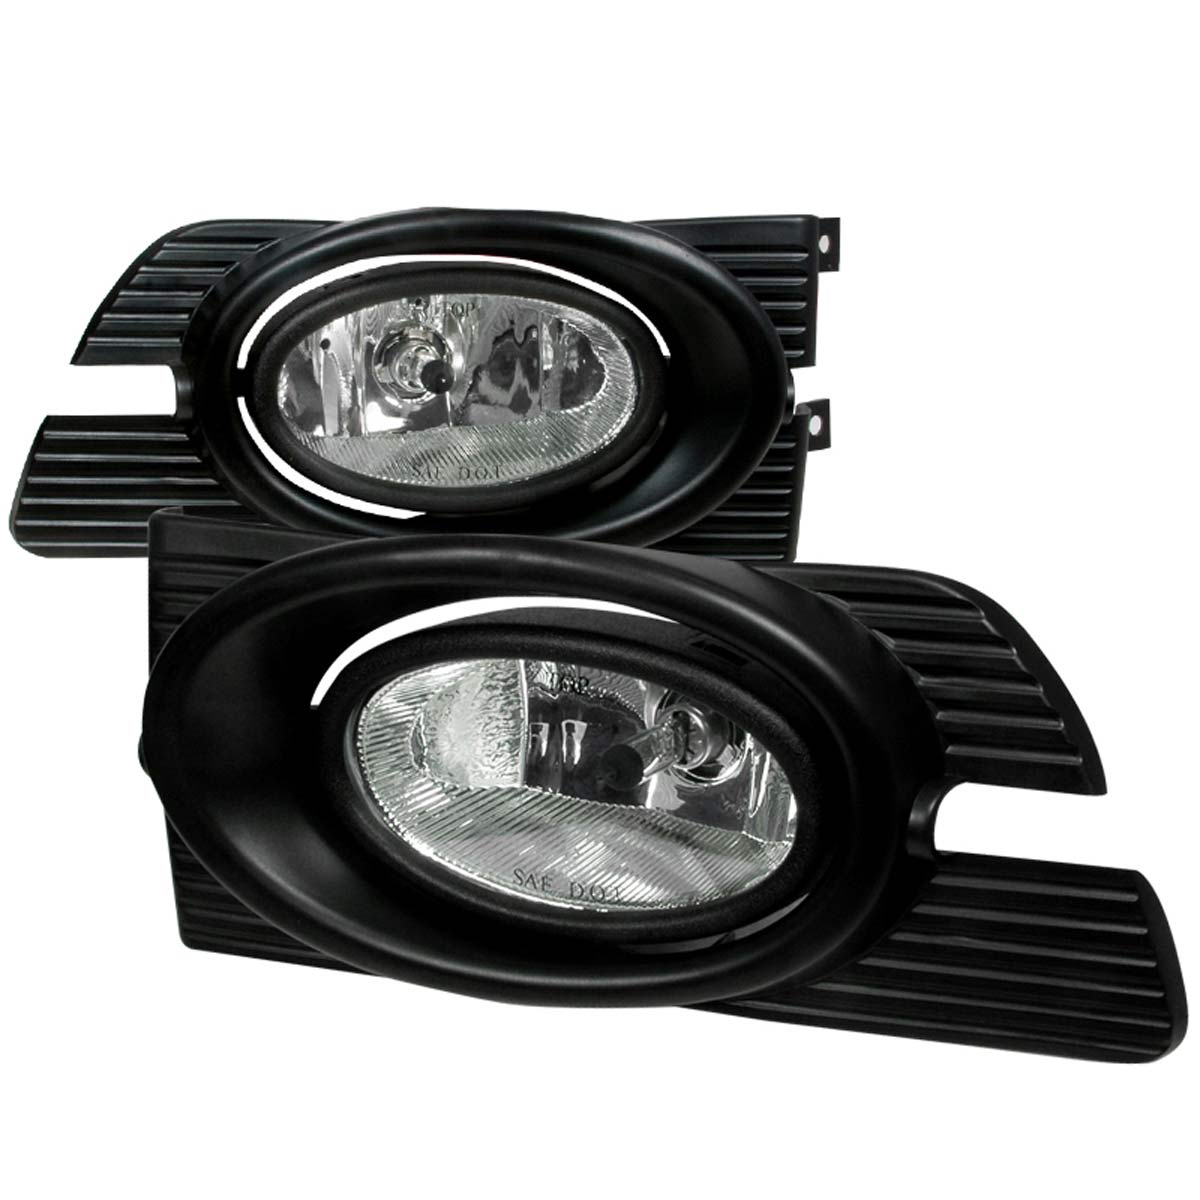 Spec-D Tuning LF-ACD014COEM-WJ - Spec-D 01-02 Honda Accord 4dr Oem Fog Lights